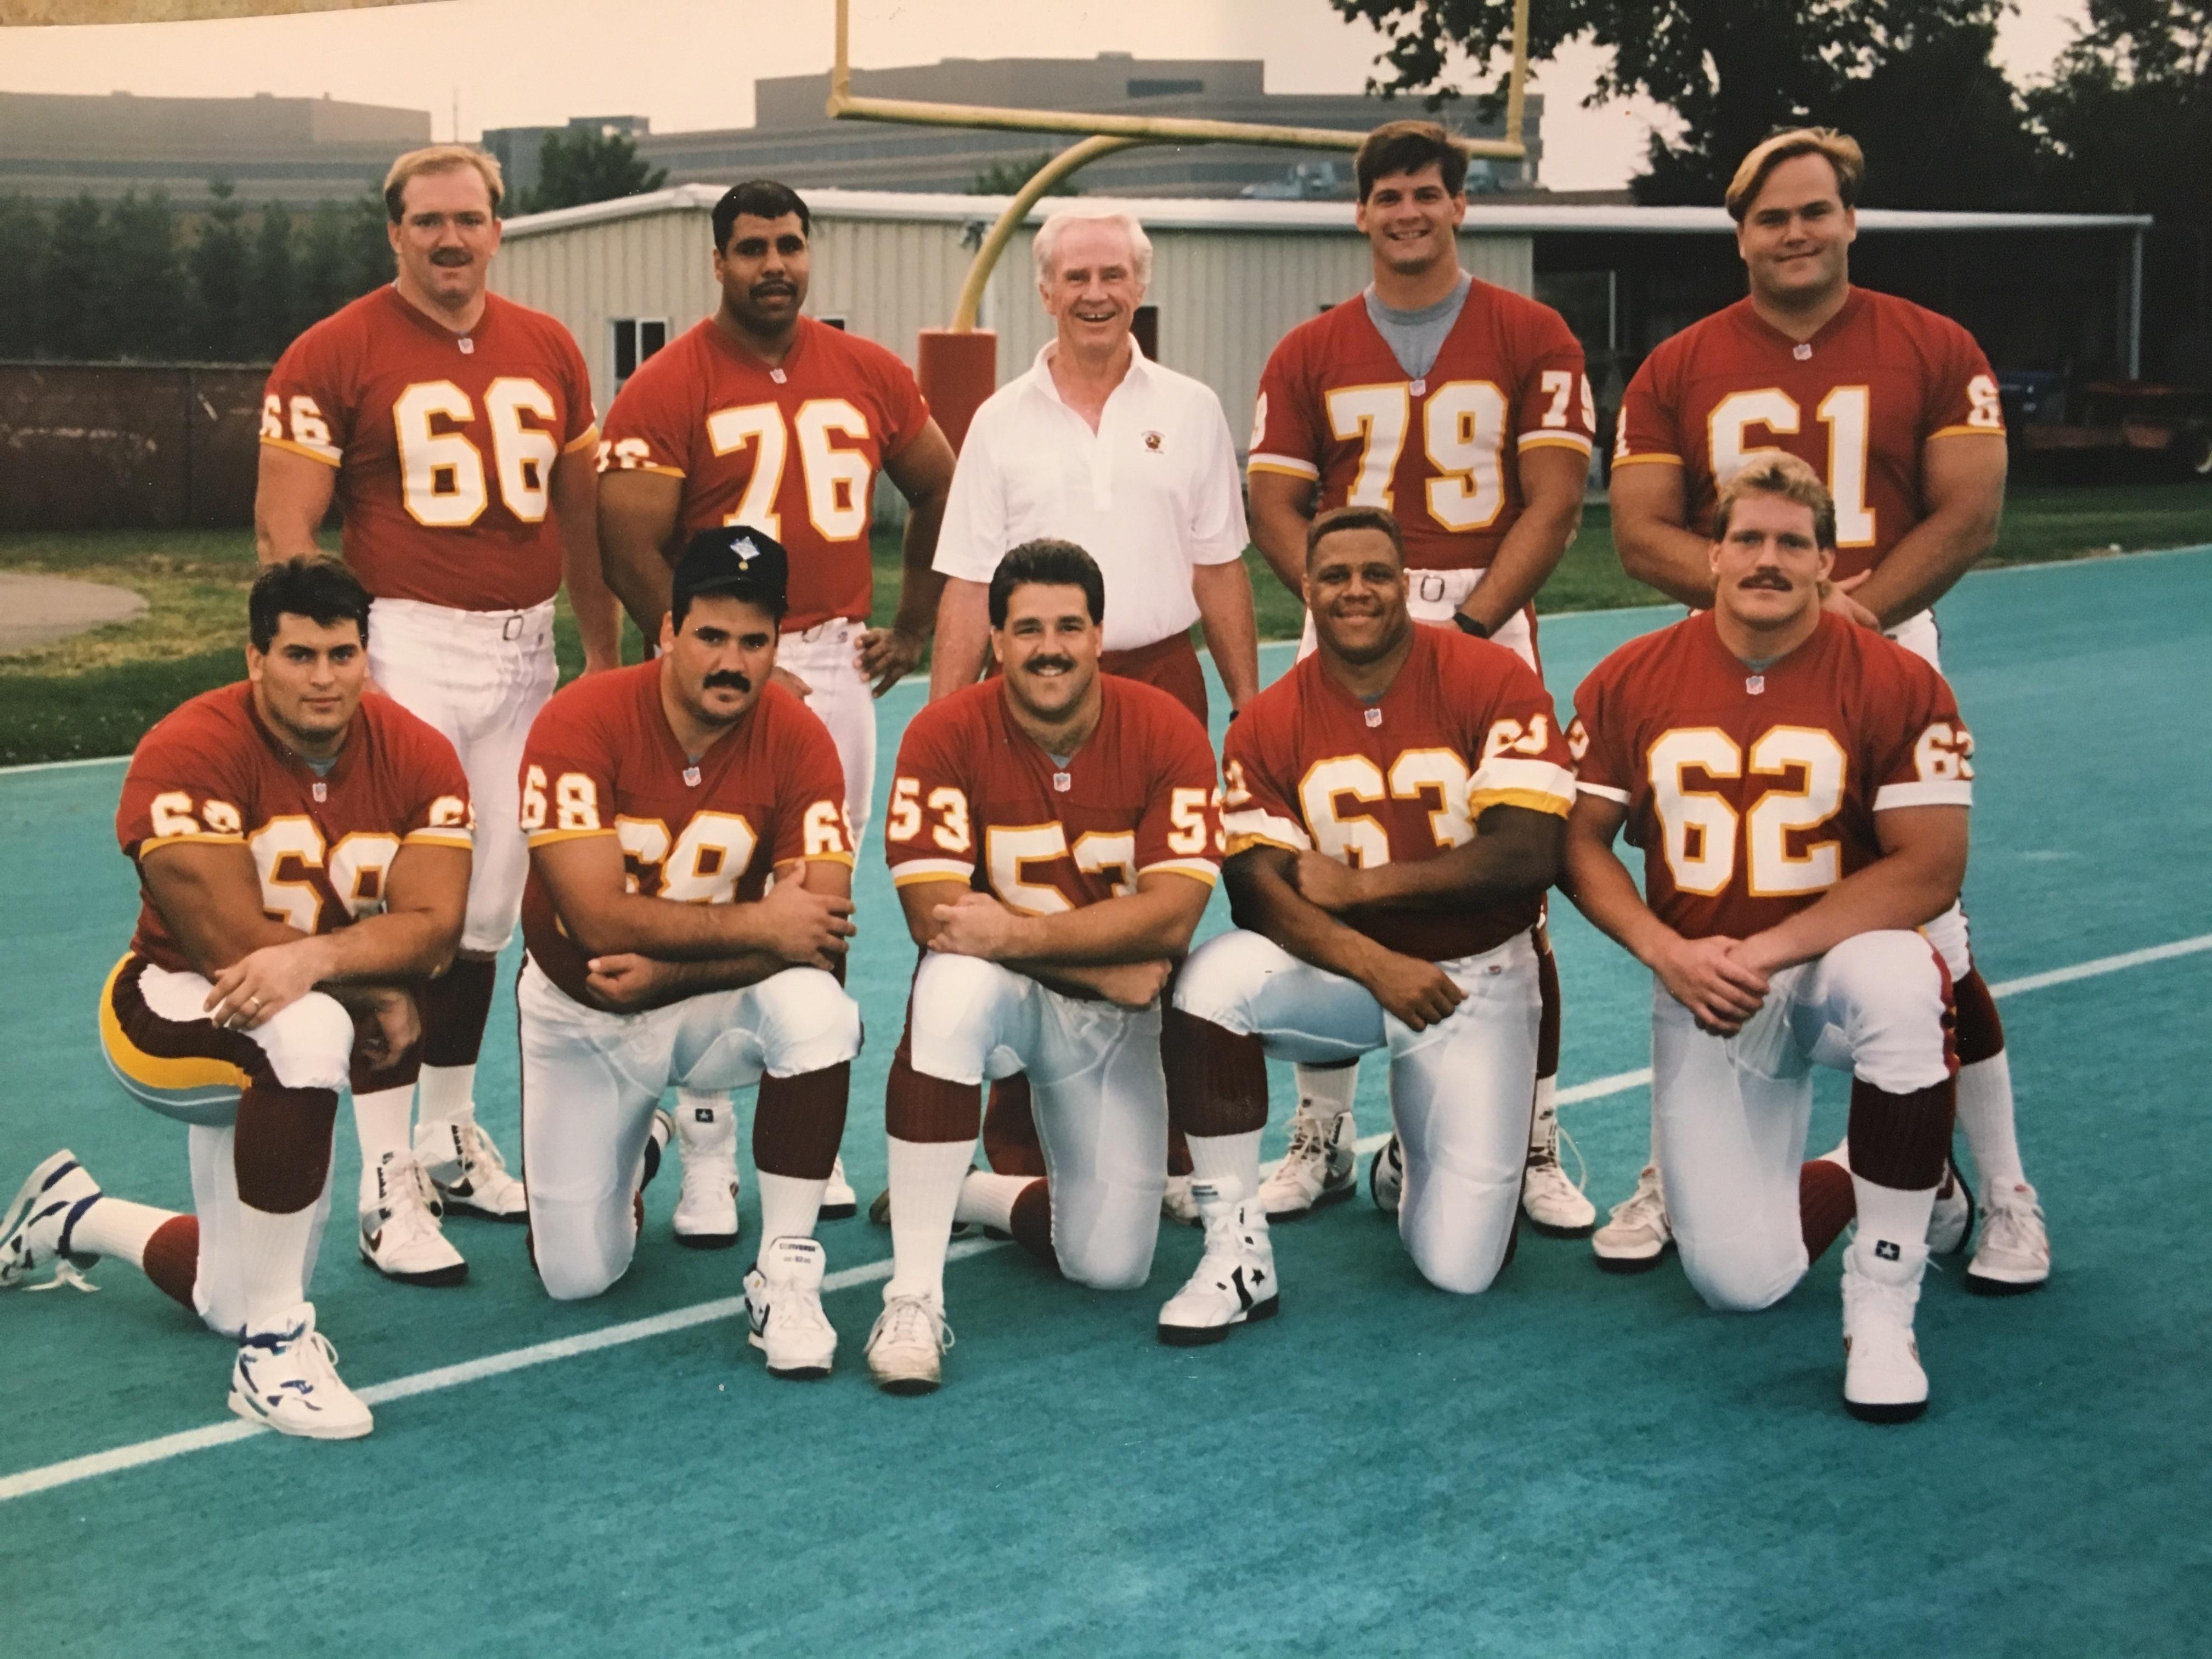 Super Bowl Champion Turned Orthopedic Surgeon with regard to Washington Redskins Nfl Championships 1992